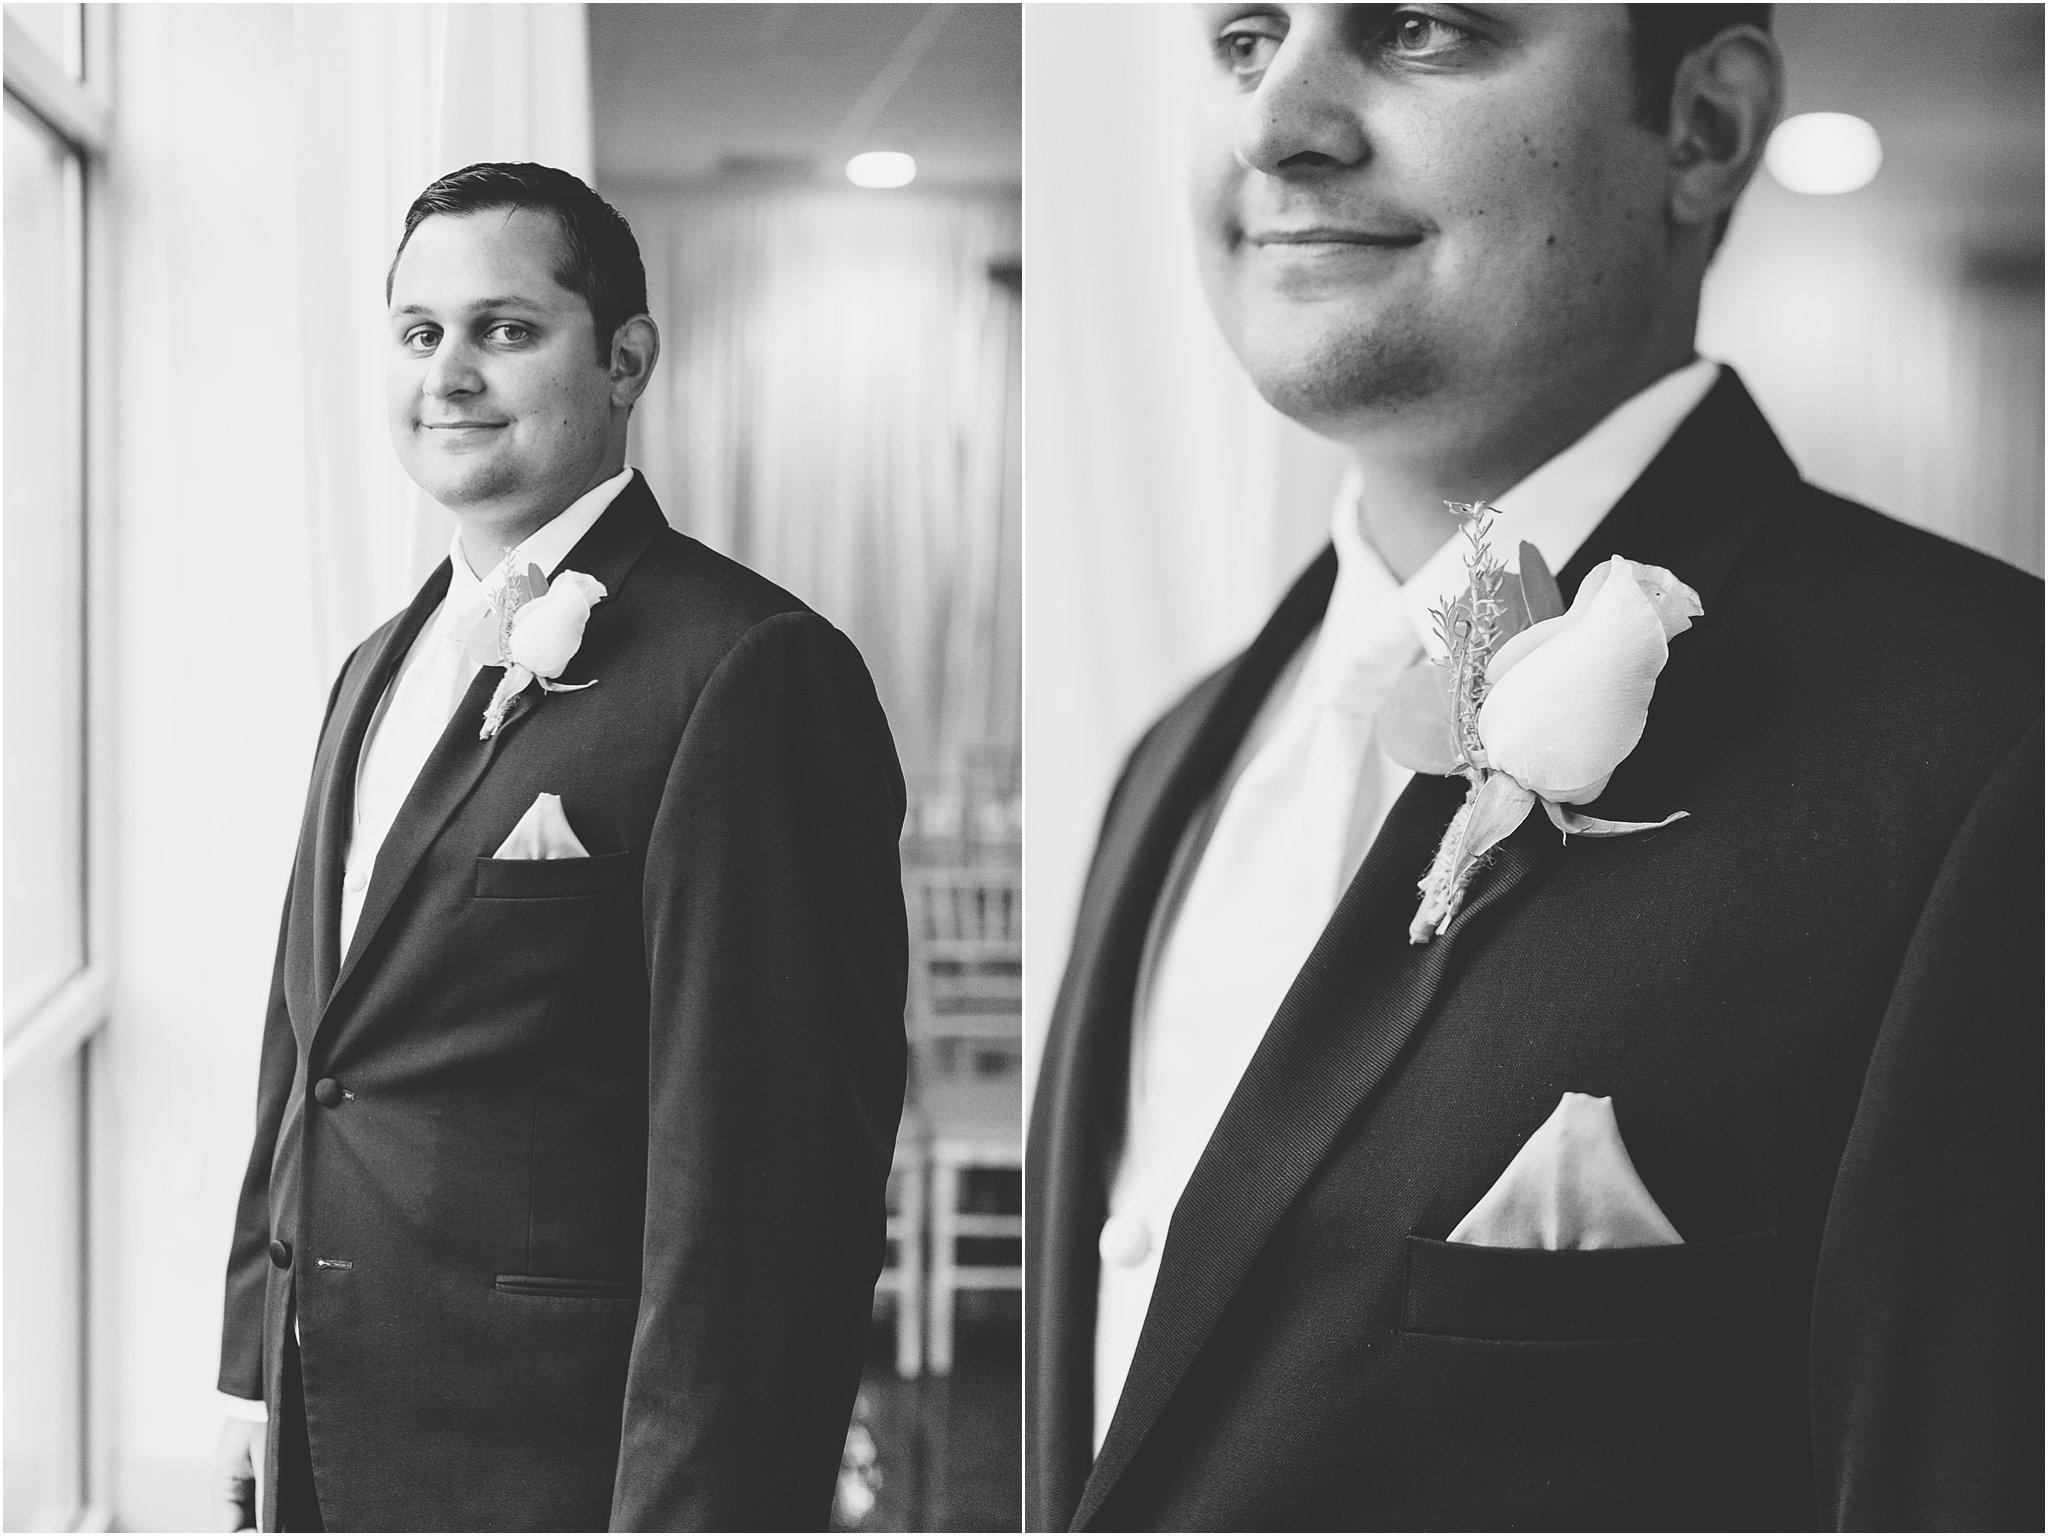 jessica_ryan_photography_virginia_wedding_photographer_wedding_hurricane_norfolk_botanical_gardens_hurricane_matthew_wedding_3572